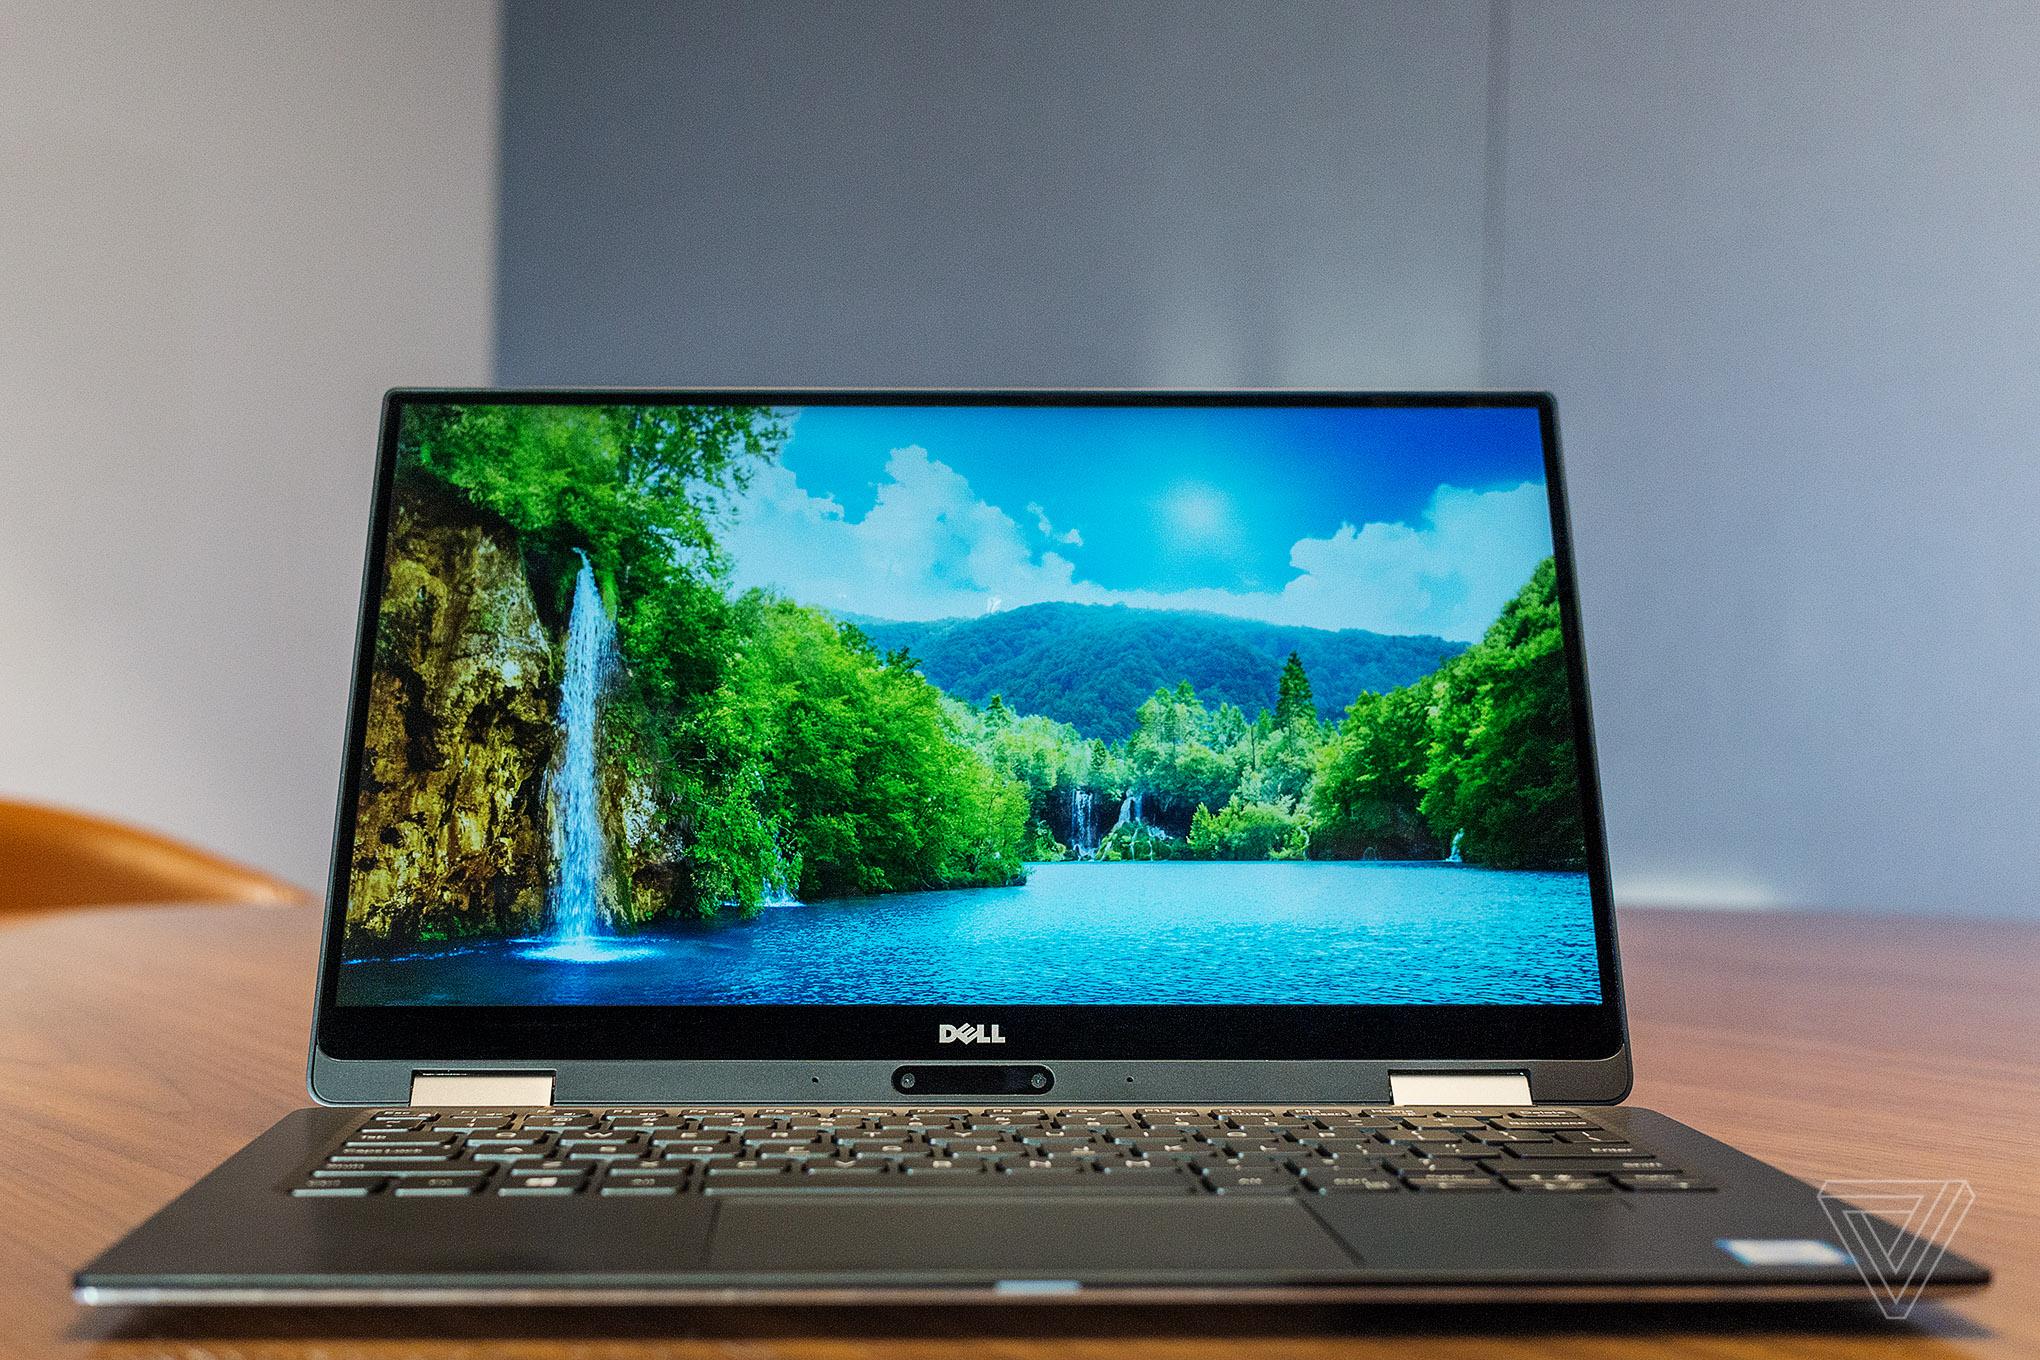 Dell готовит к выпуску гибридный ноутбук Dell XPS 13 2-in-1 на базе Intel Core M